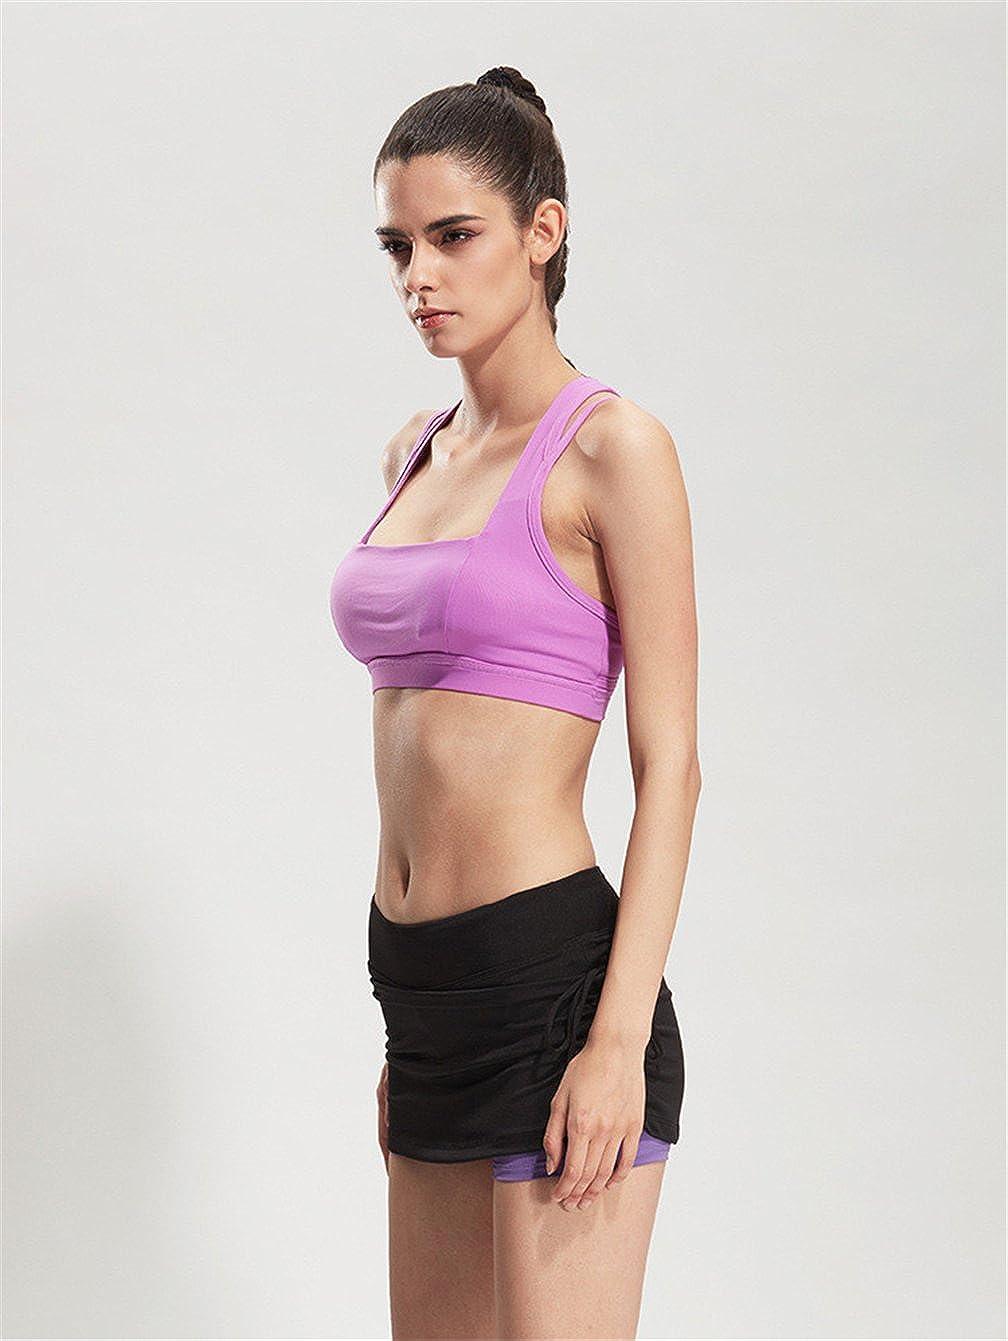 DOLINXH Sport Bra Top Fitness Women Sport Bra Top Sport Yoga ...